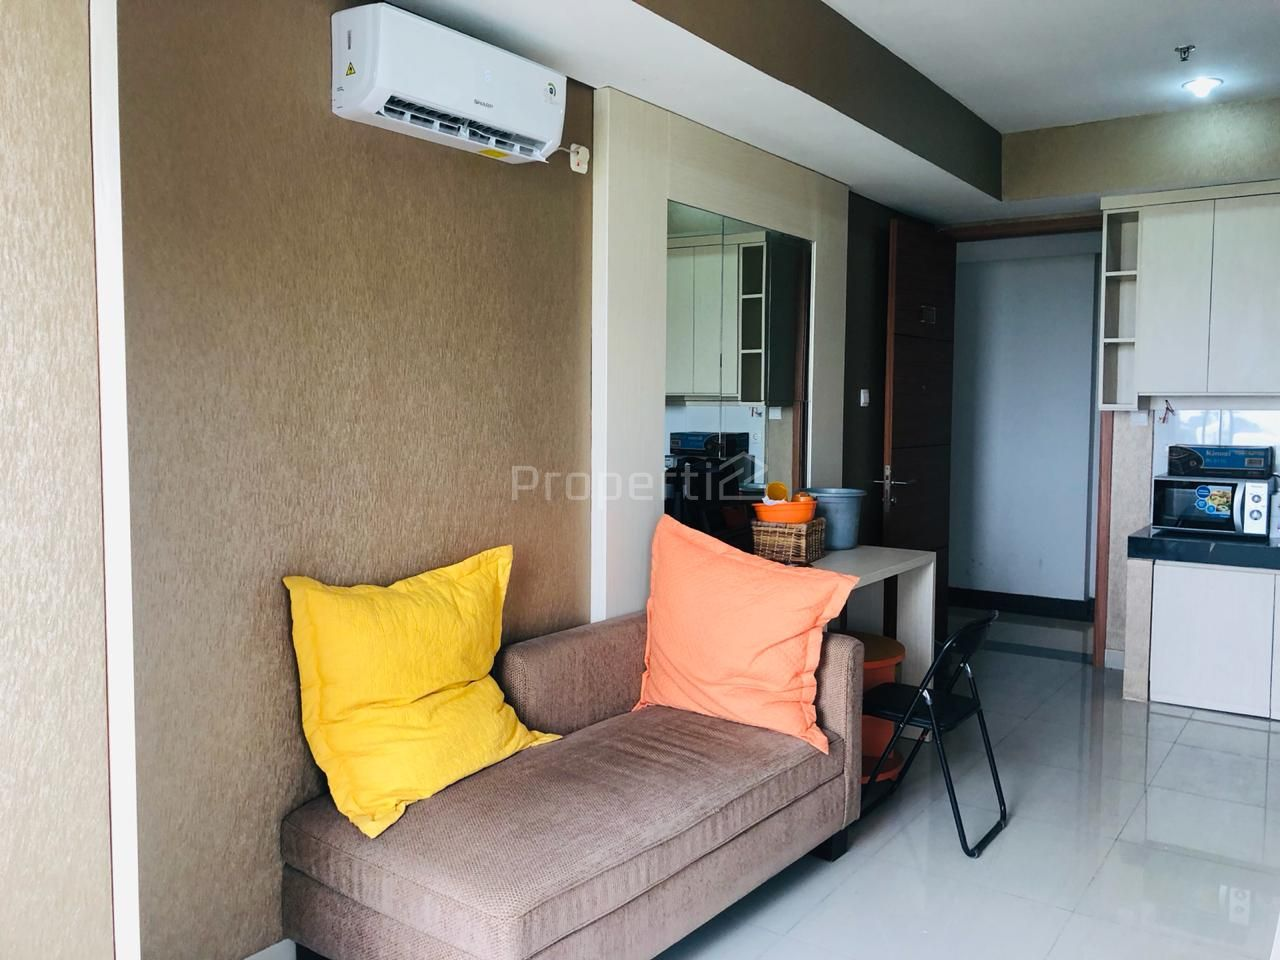 Unit Apartemen Brand New di Dago Suites Apartment, Lantai 3, Kota Bandung